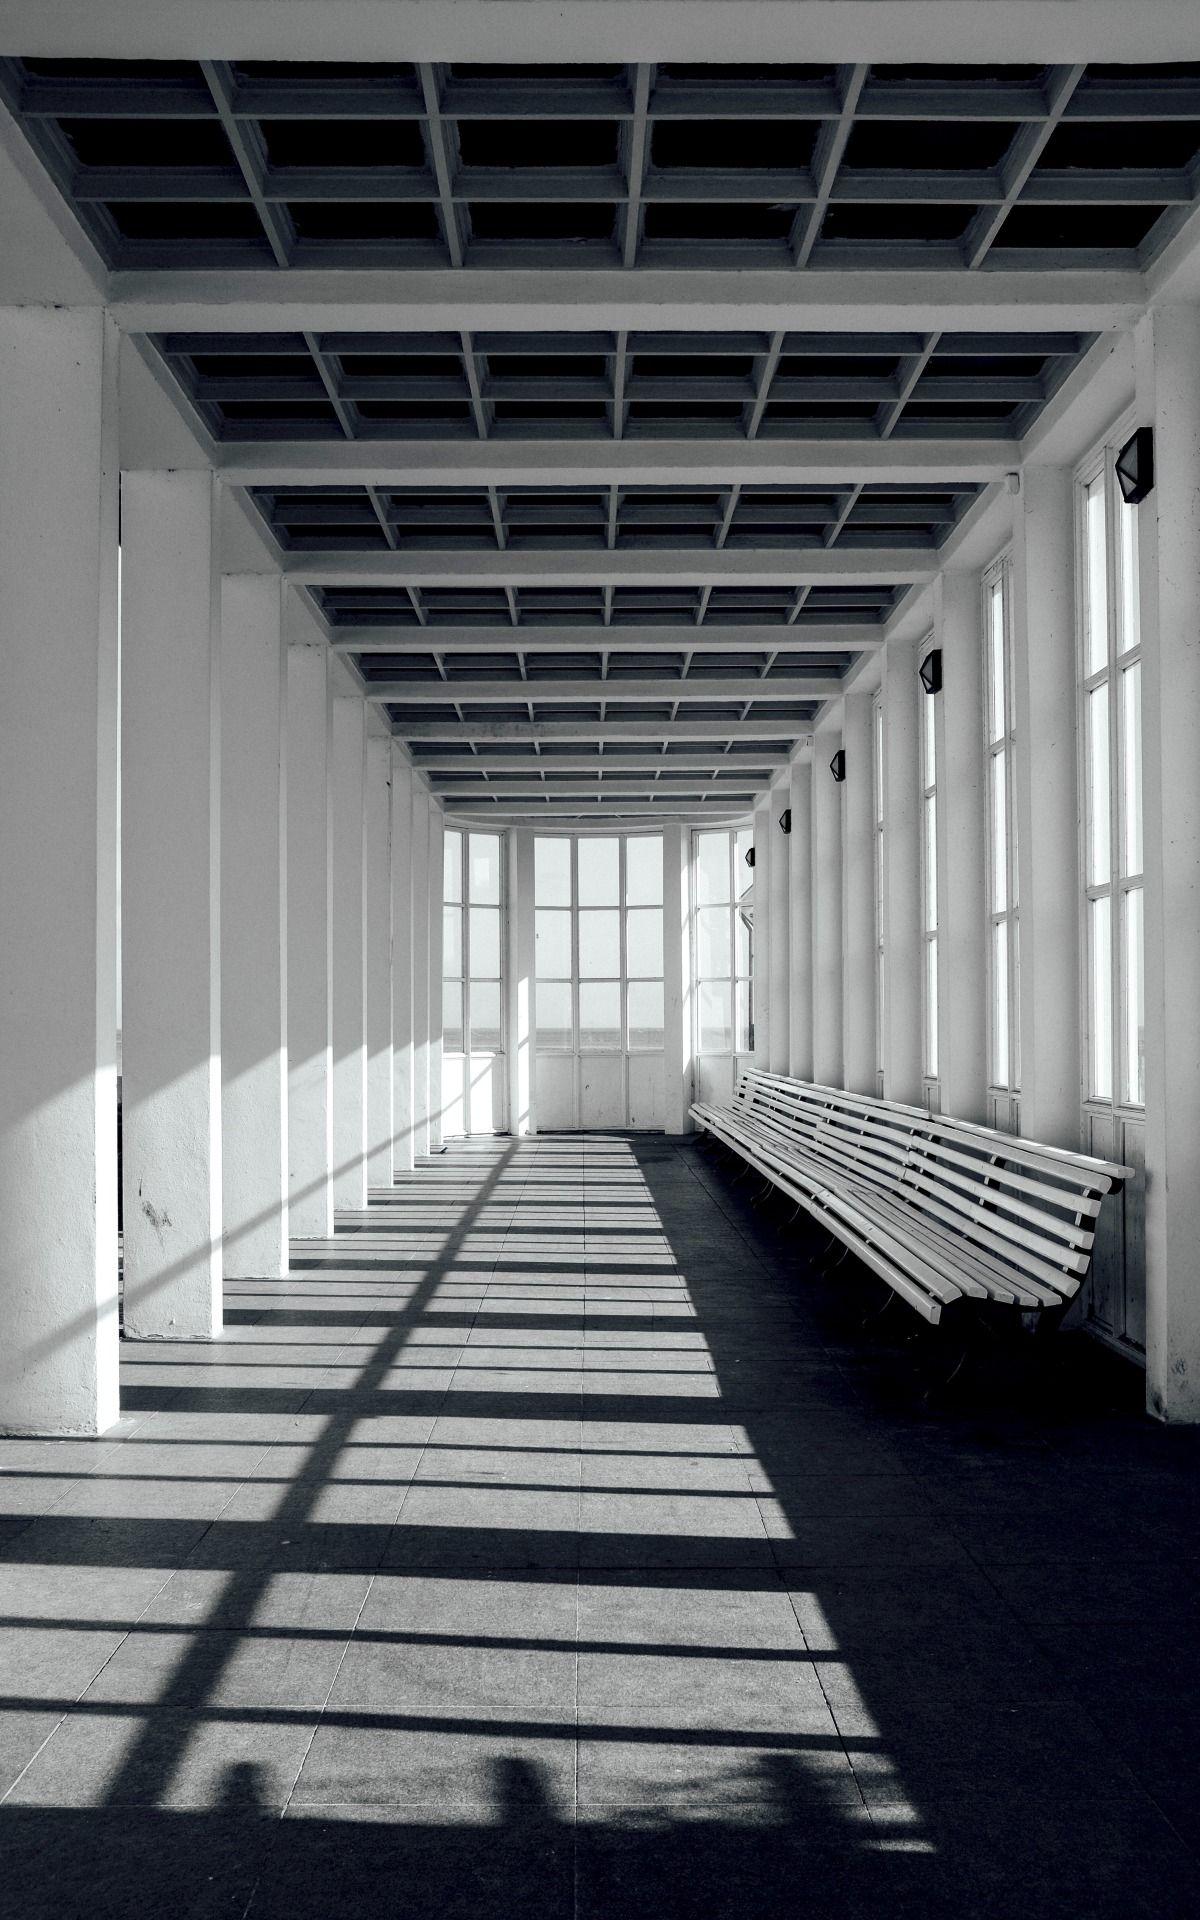 Spatial rhythm - #and #architecture #bäderarchitektur #baltic #binz #black #contemplation #meolog #on #original #ostsee #photographers #rhythm #rügen #sea #source: #tumblr #white